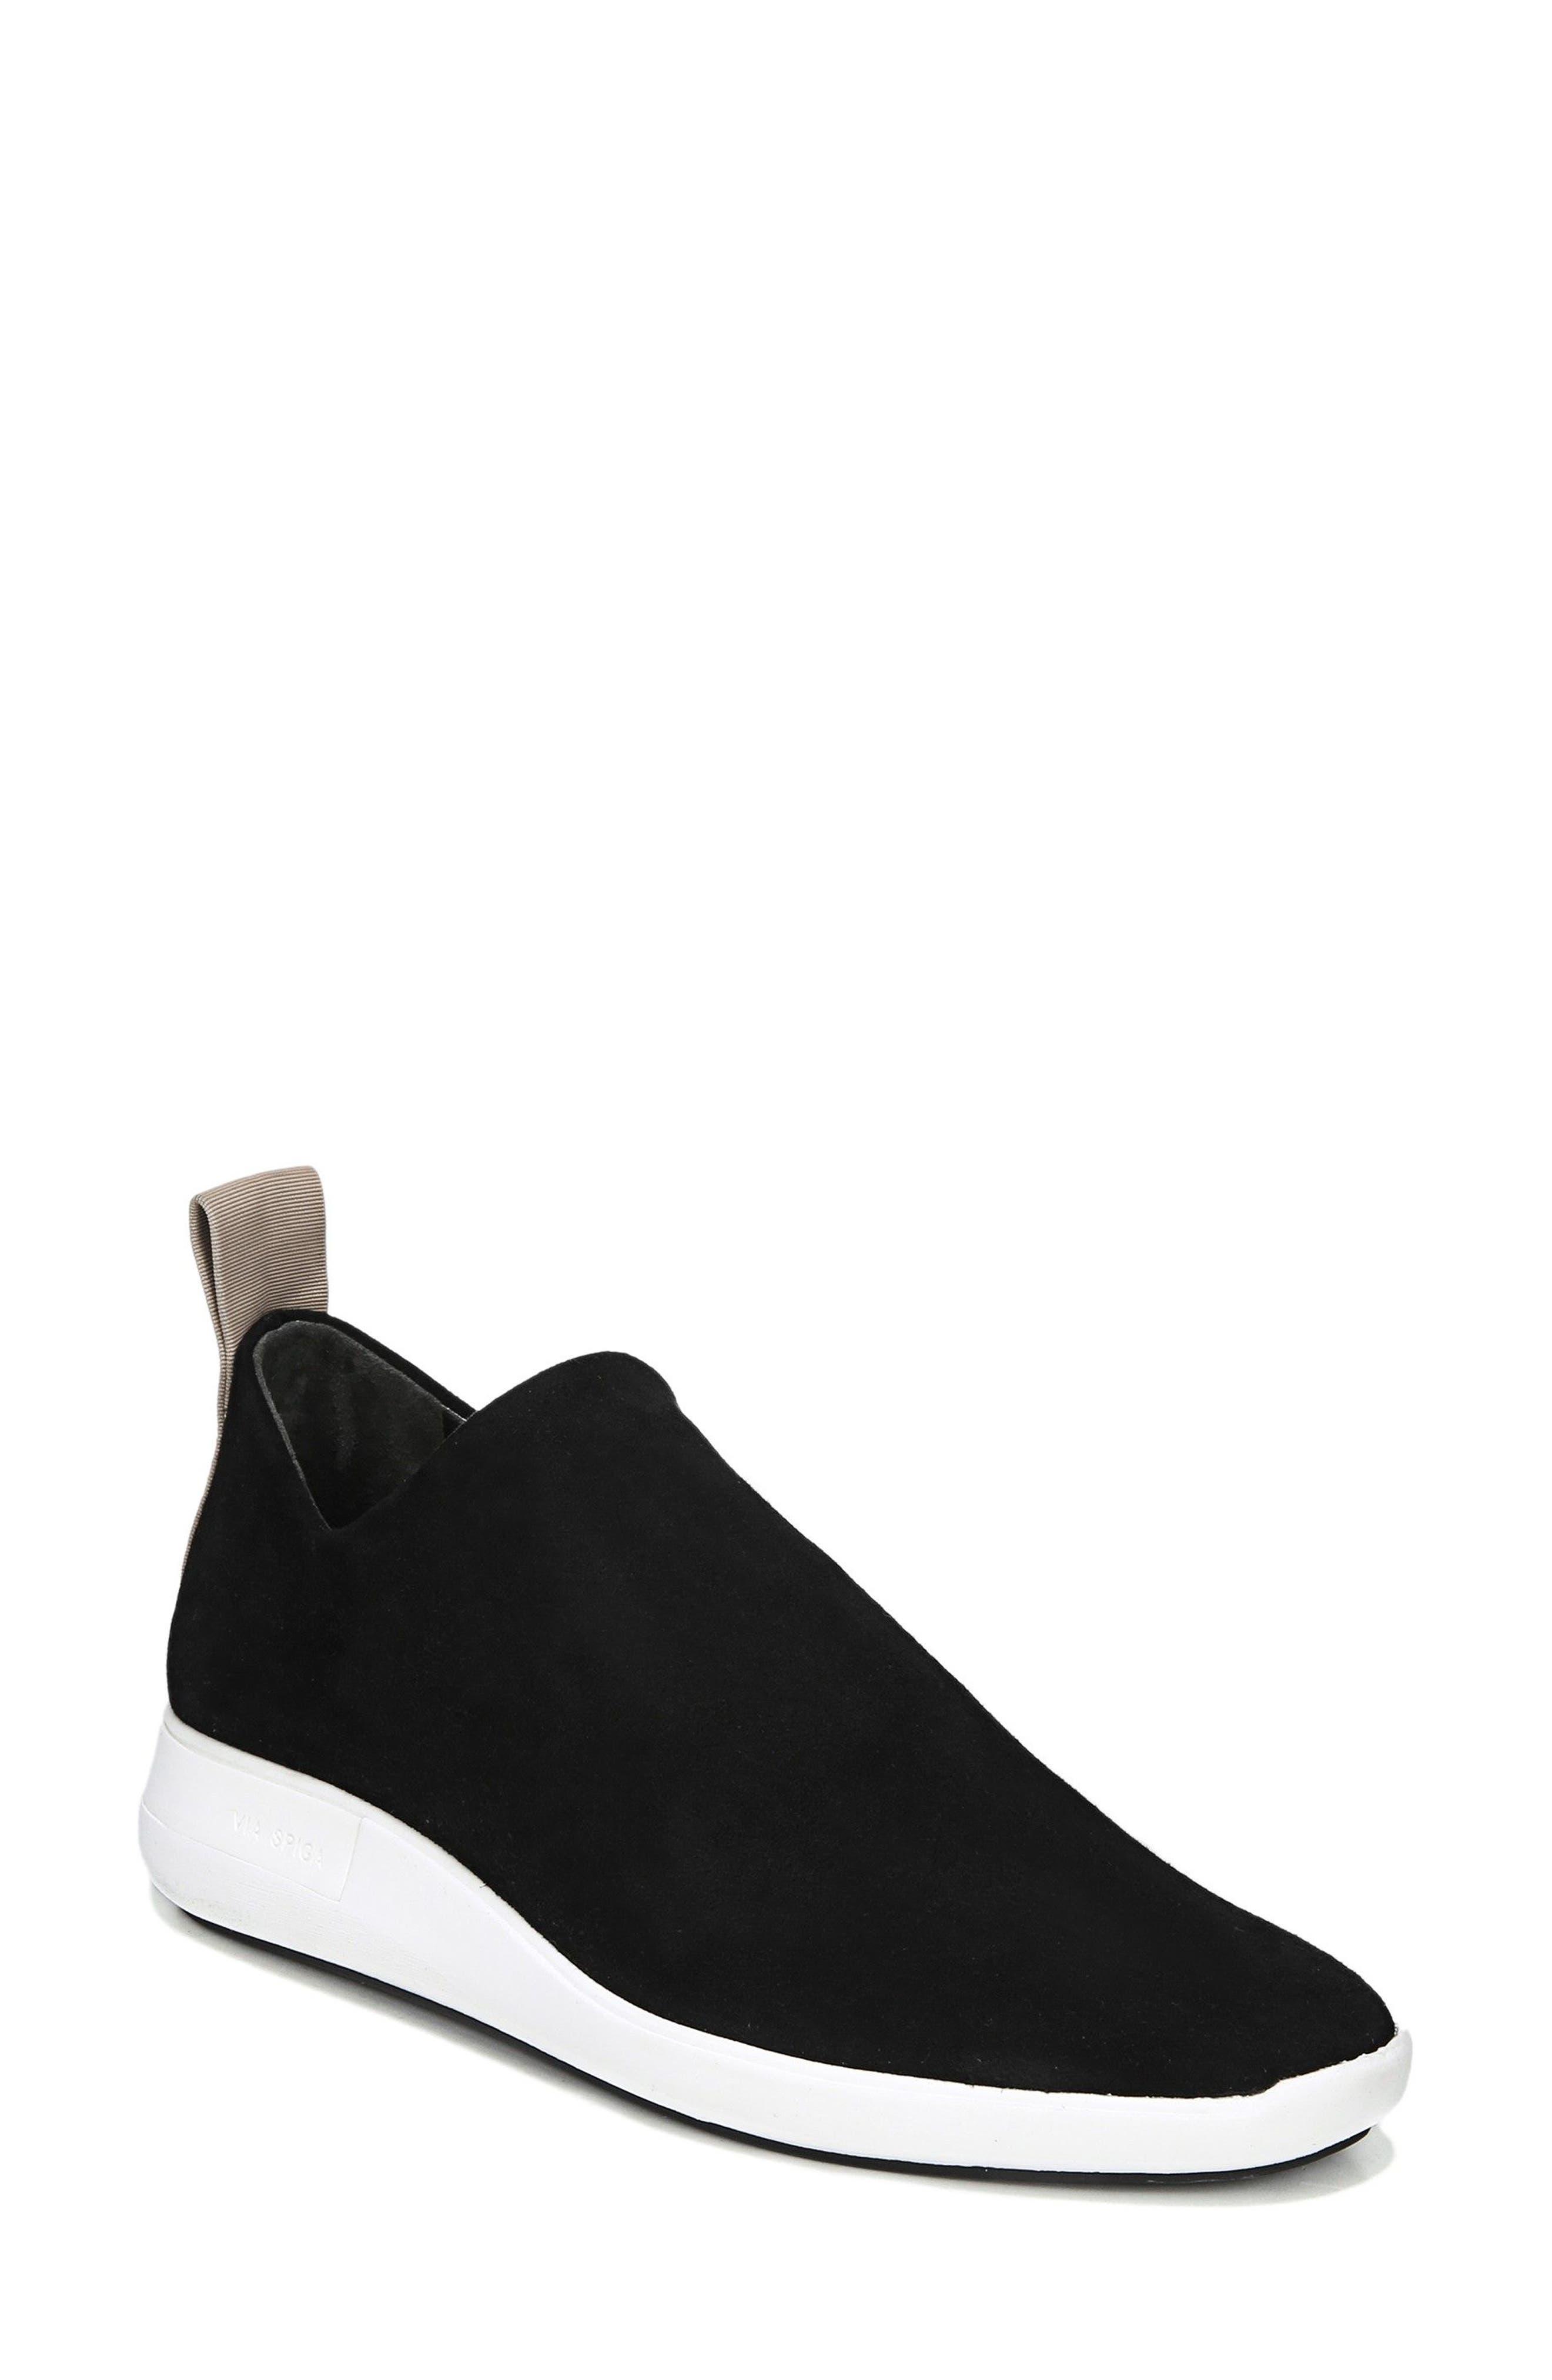 VIA SPIGA, Marlow Slip-On Sneaker, Main thumbnail 1, color, BLACK SUEDE